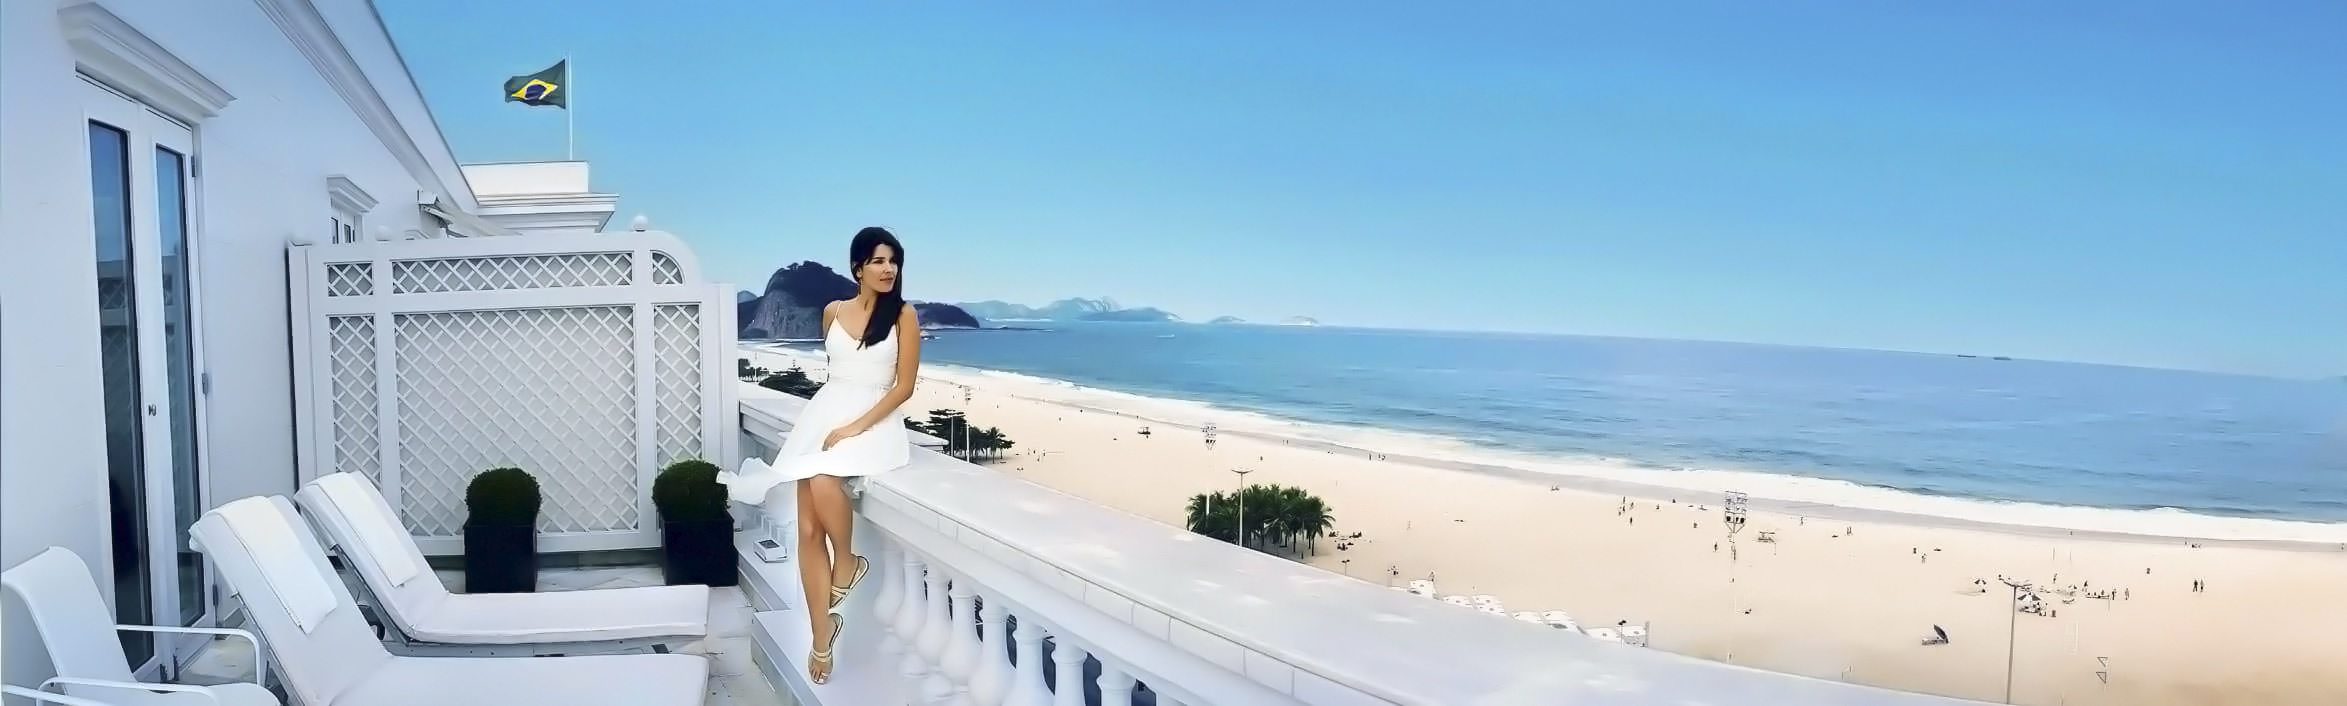 belmond-copacabana-slider.jpg